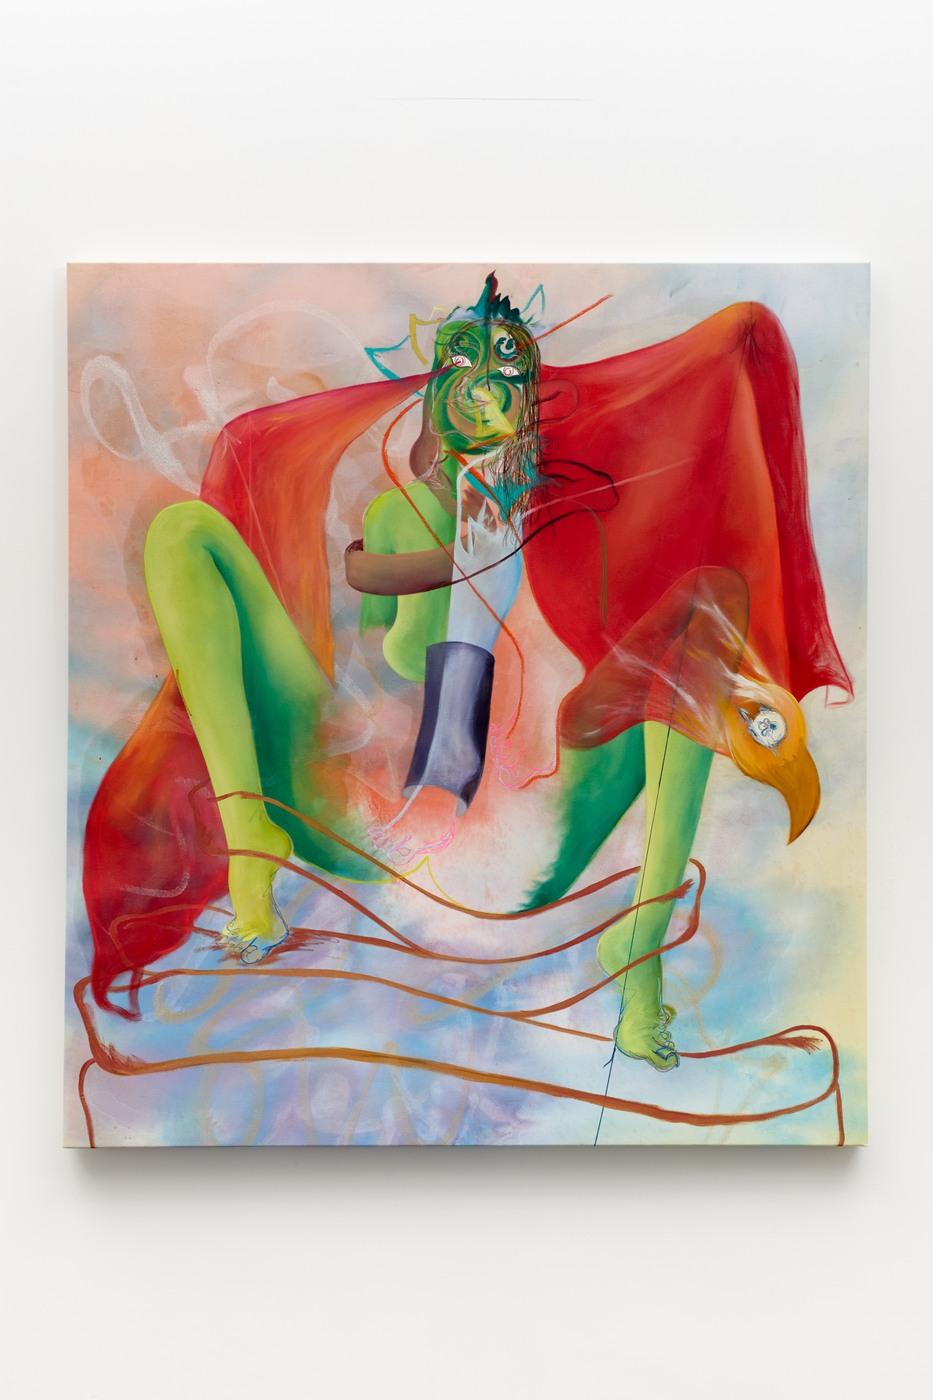 04. Nora Berman - Piped Woman, 2016